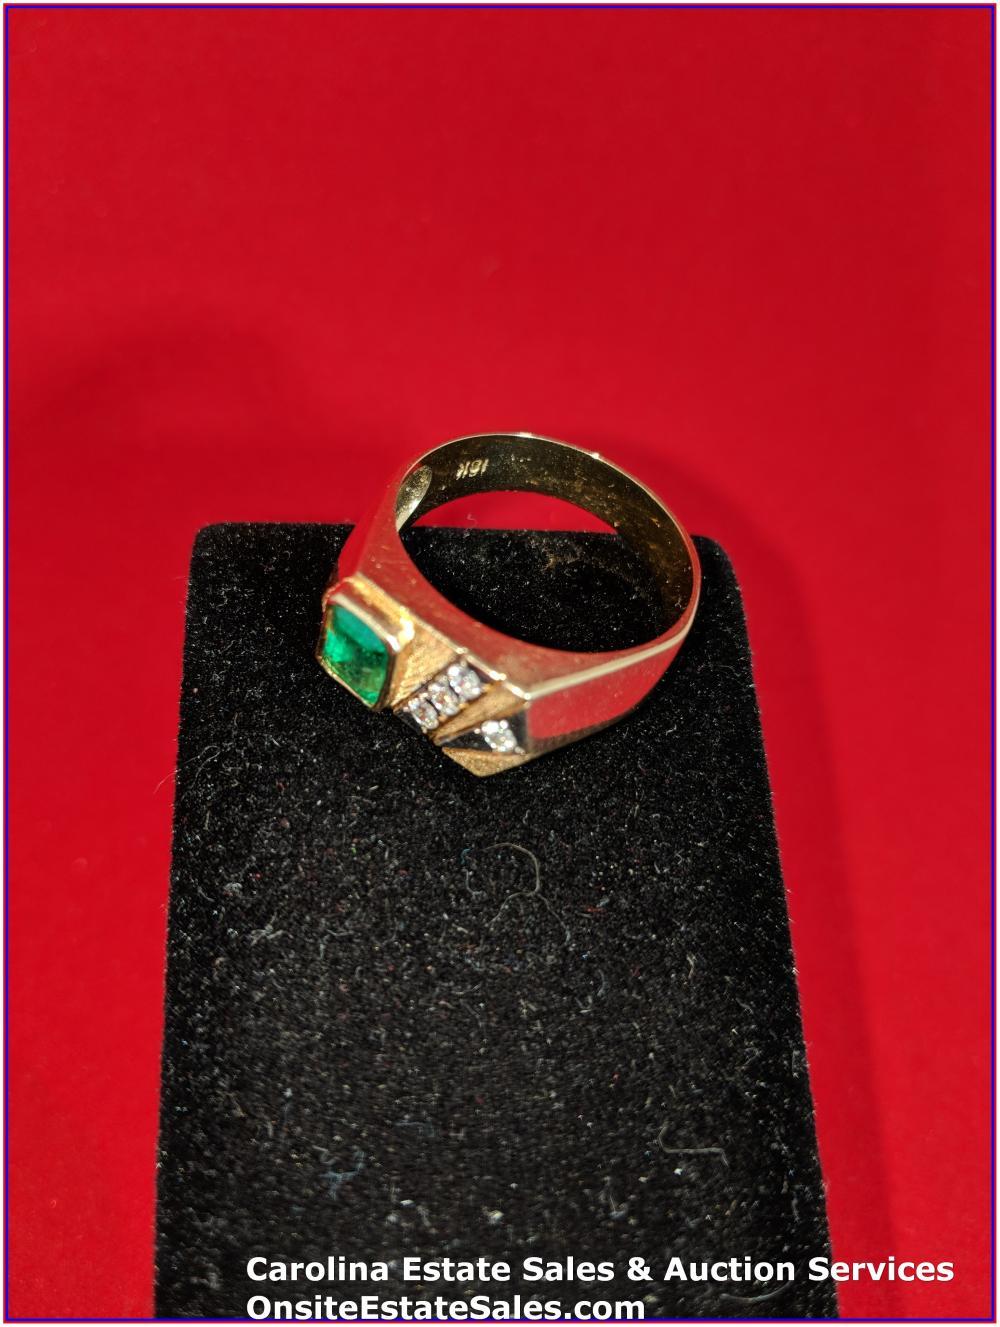 18K Gem Ring Gold 7 Grams Total Weight; 1 ct Emerald